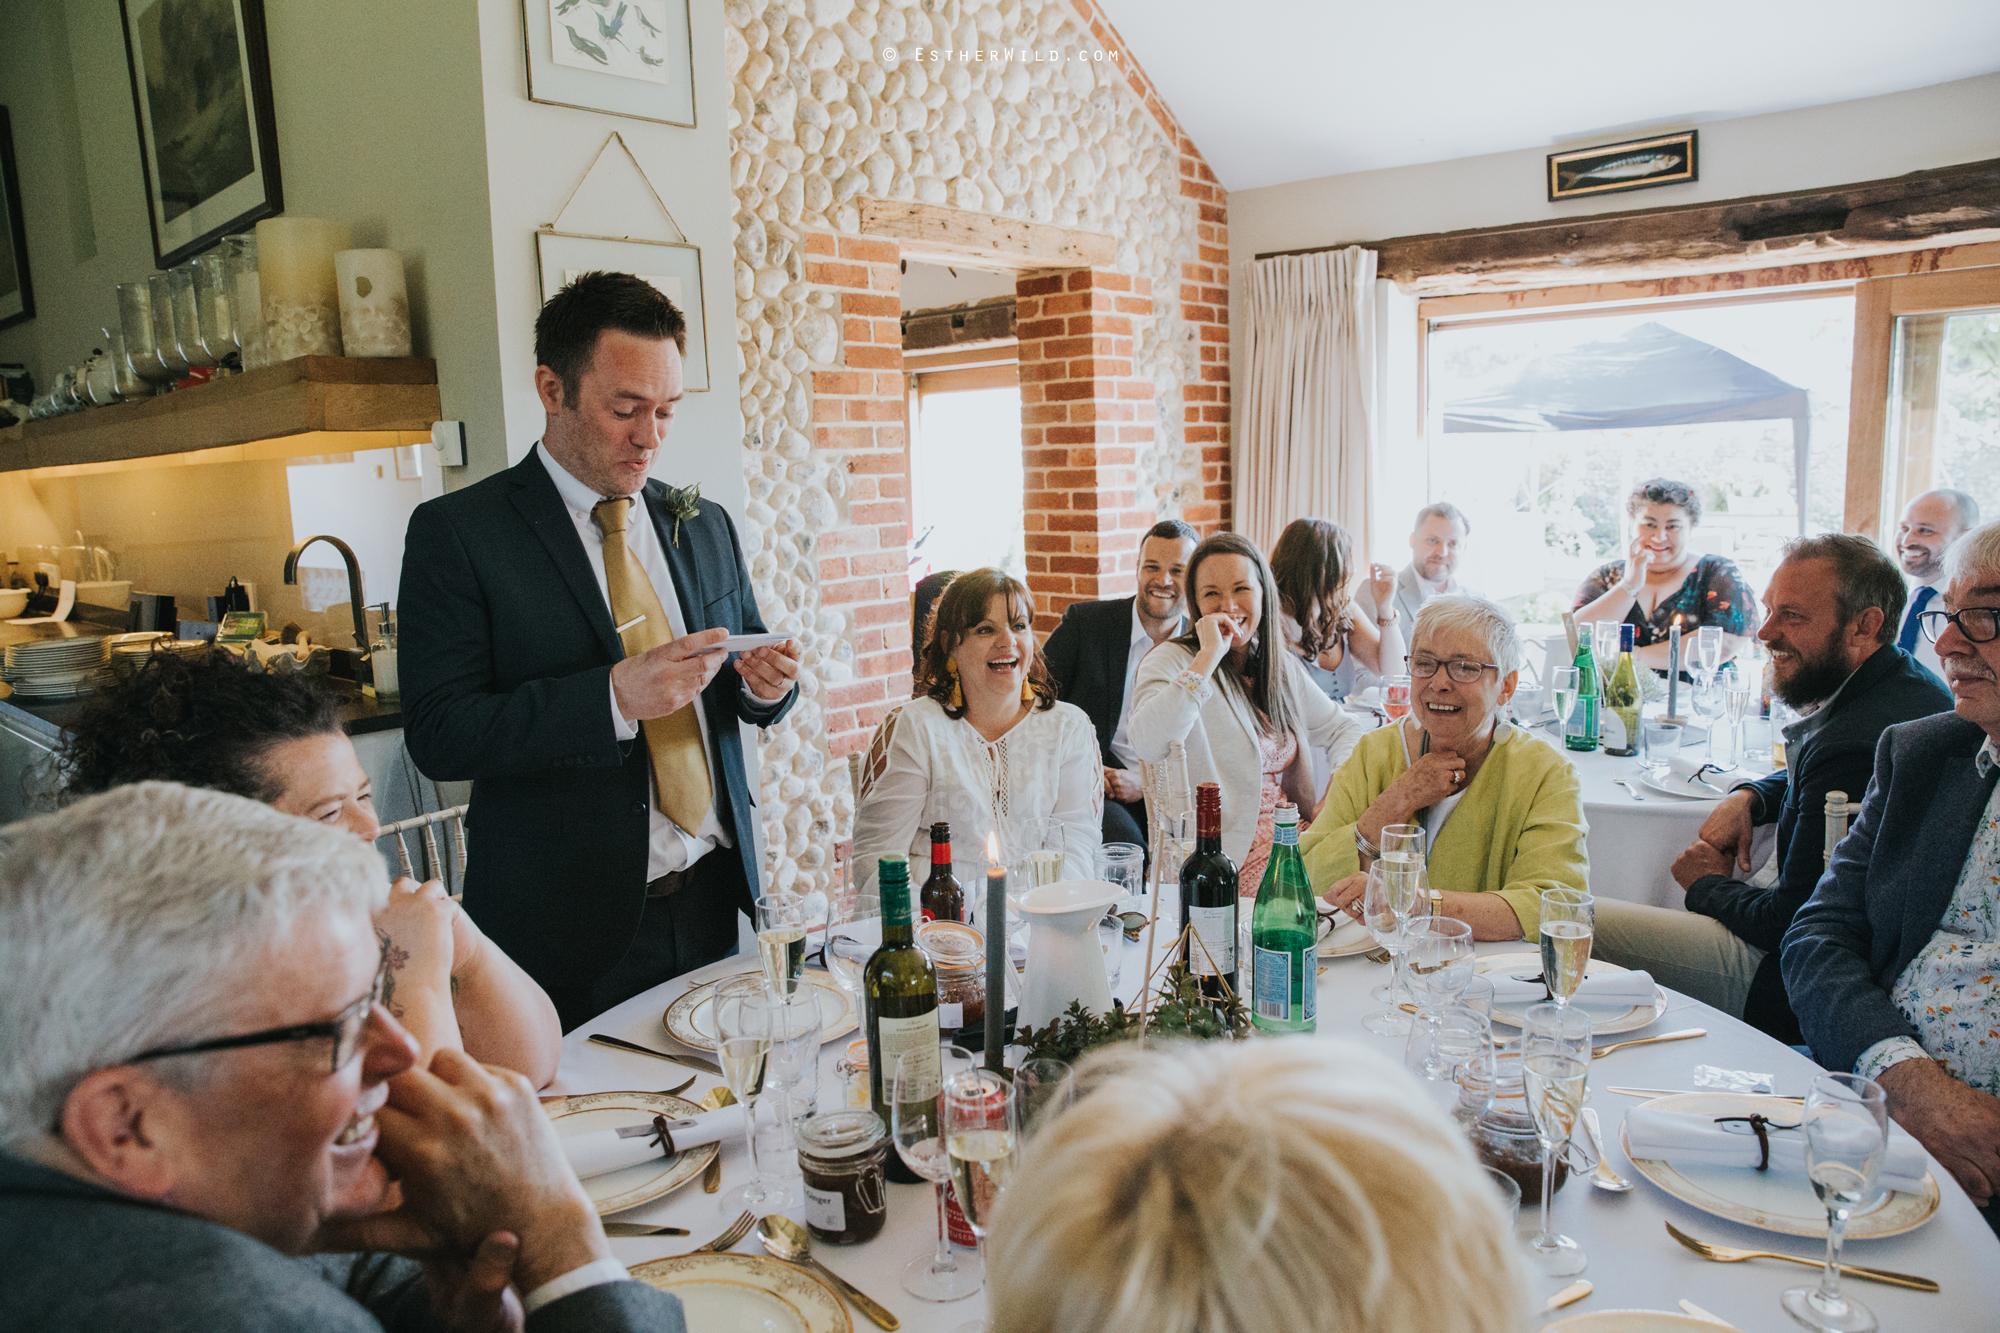 IMG_1975Cley_Barn_Drift_Norfolk_Coast_Wedding_Copyright_Esther_Wild_Photographer_.jpg